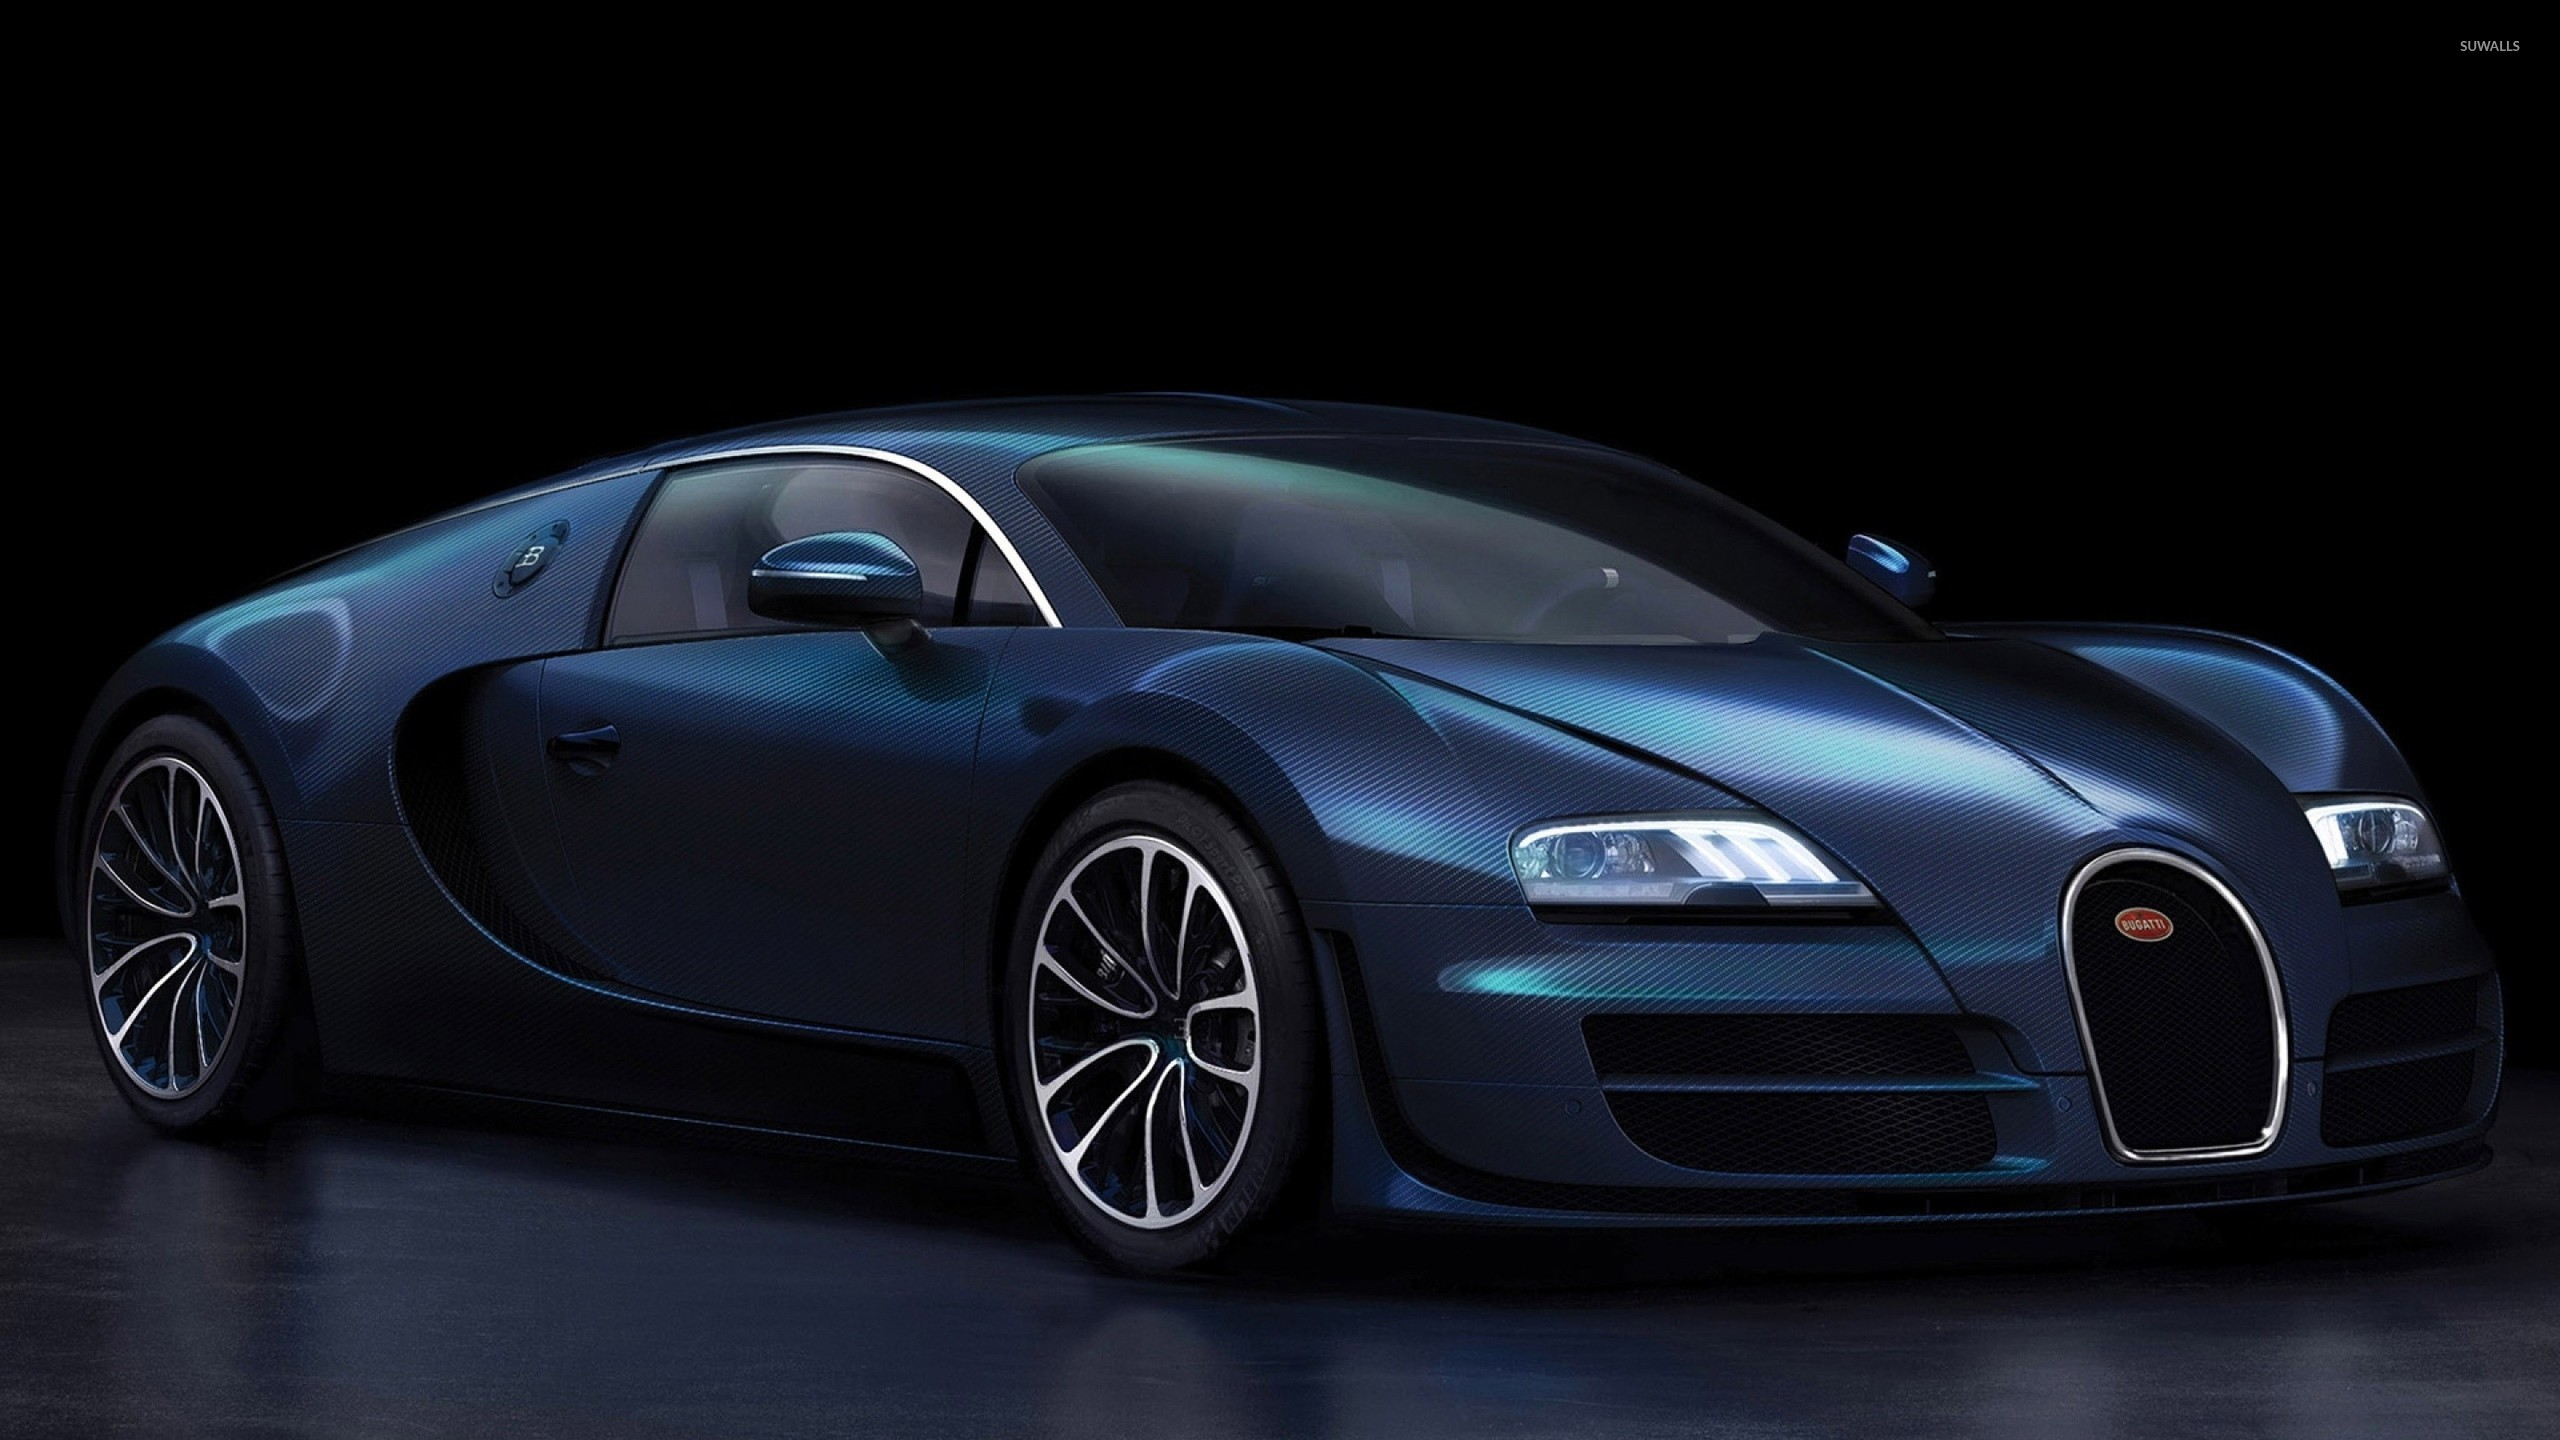 dark blue bugatti veyron front side view wallpaper car. Black Bedroom Furniture Sets. Home Design Ideas